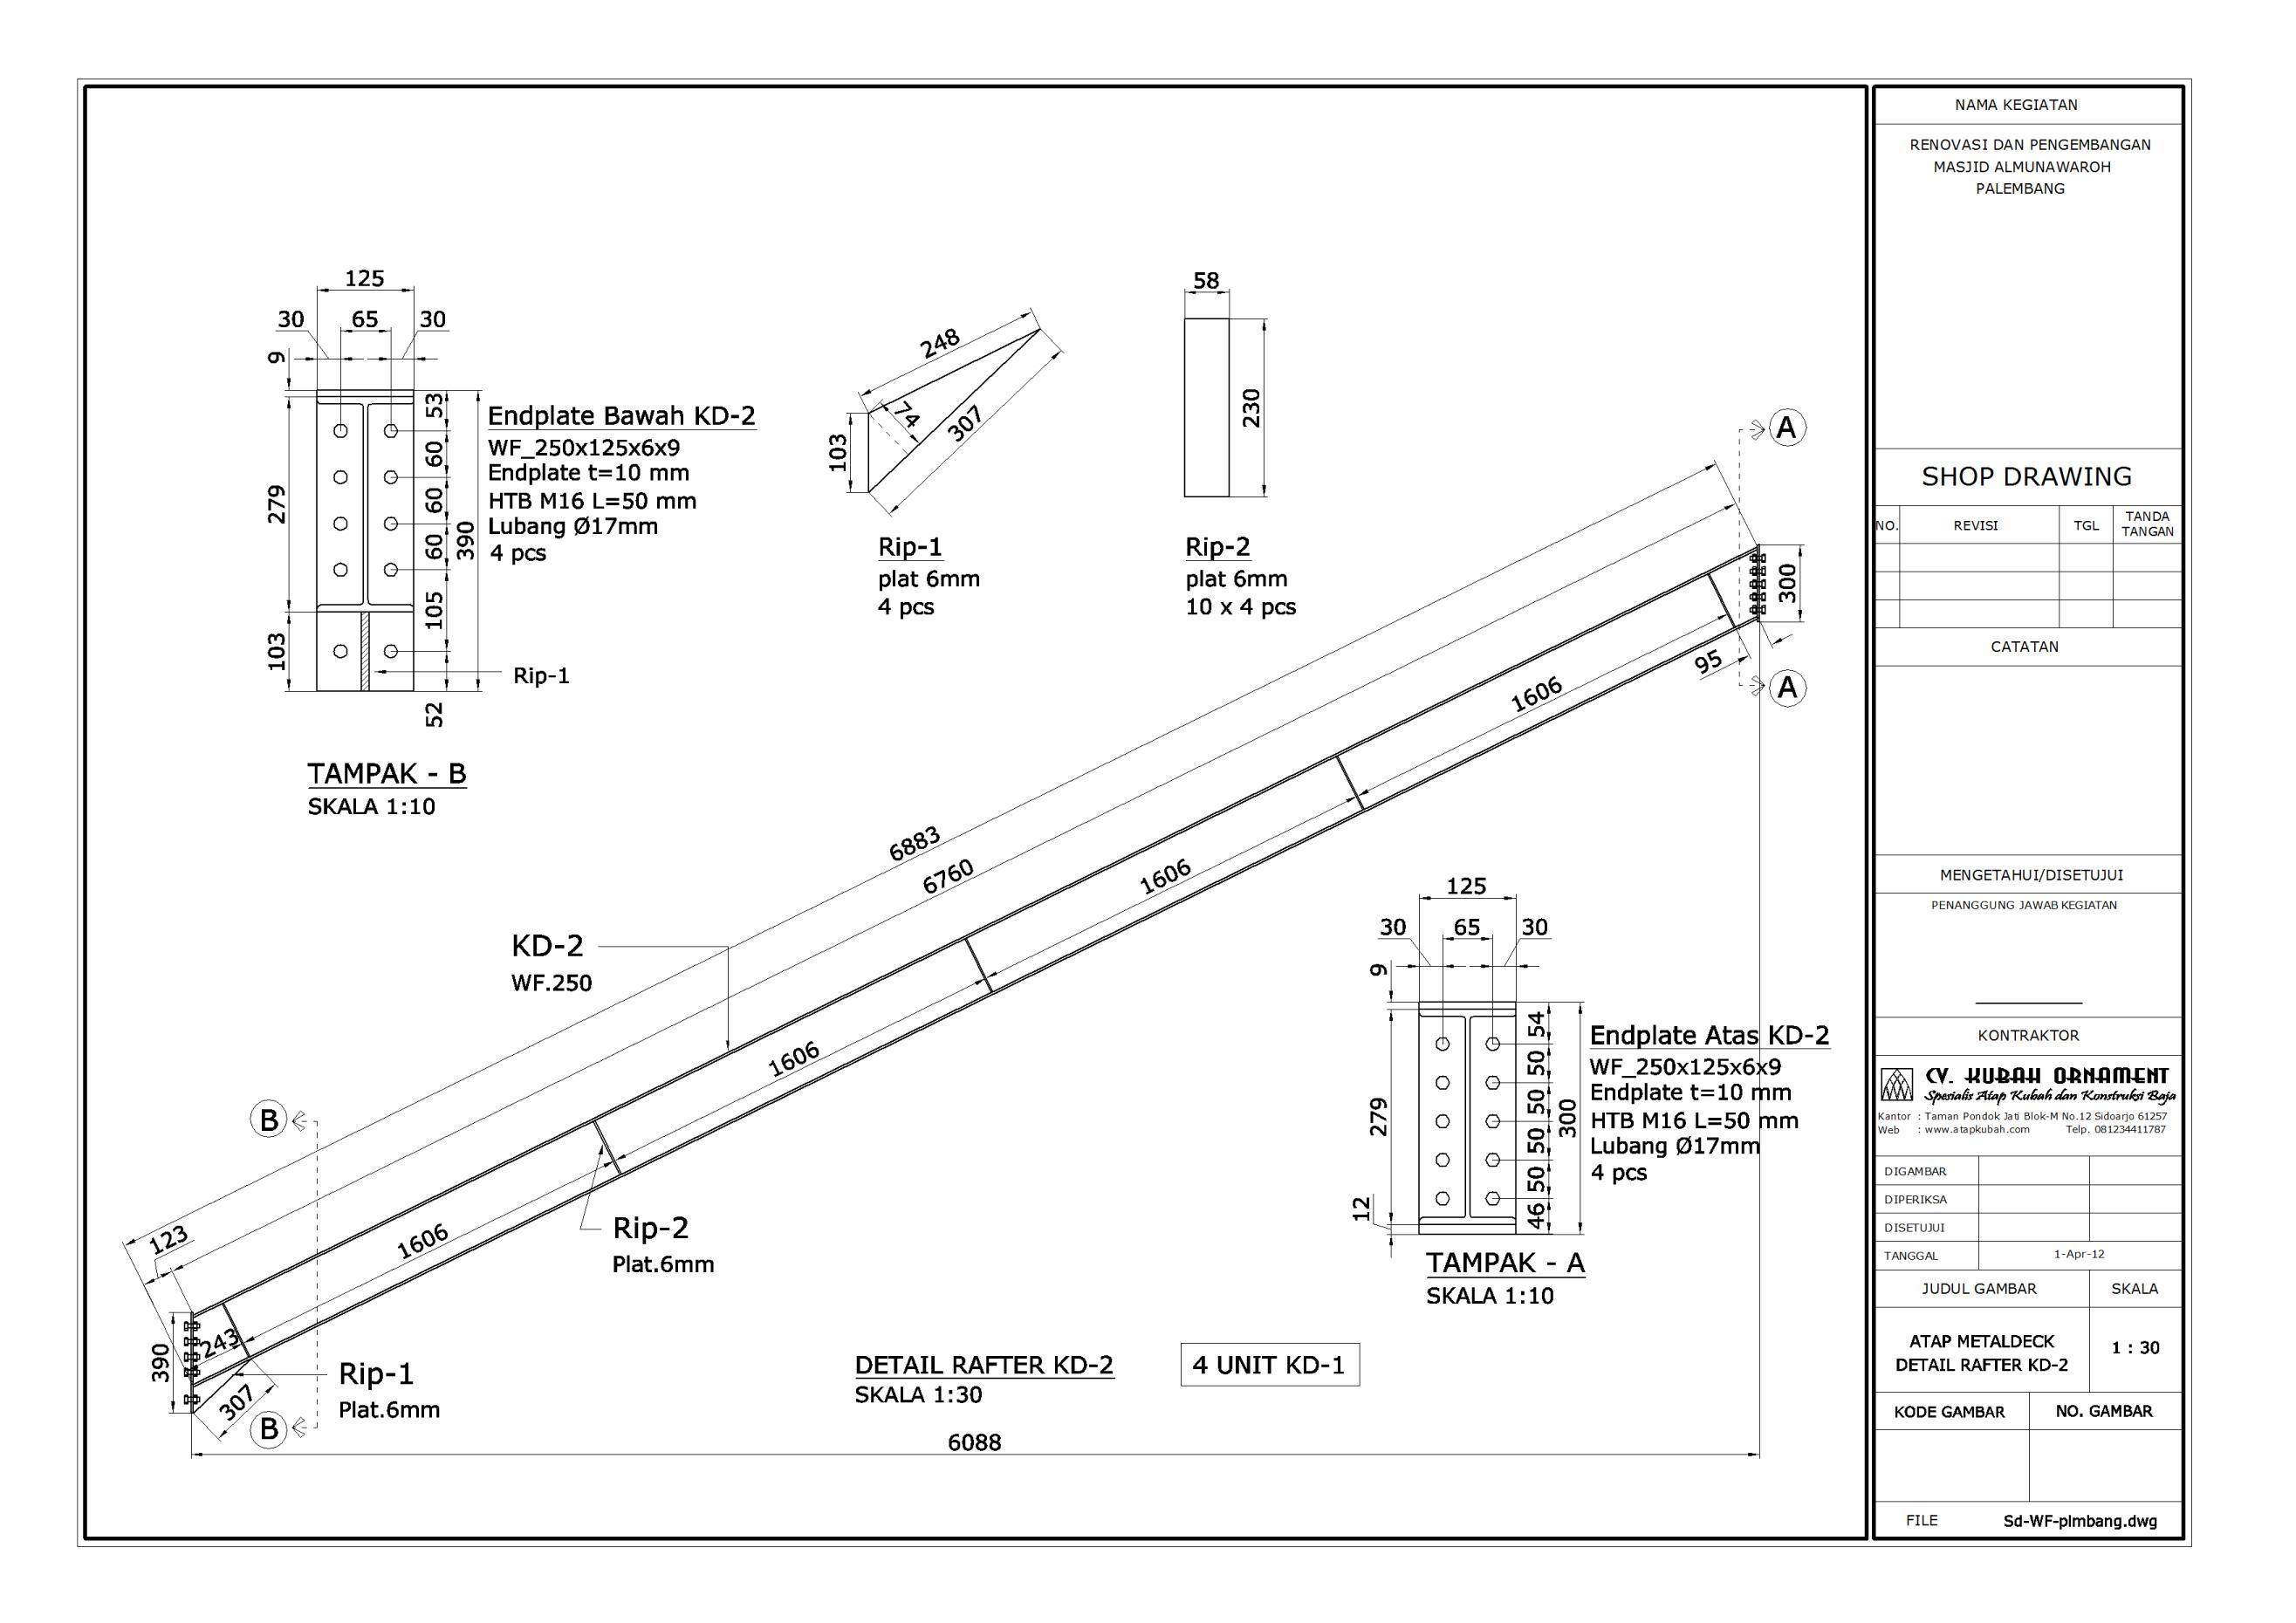 Desain Konstruksi Baja Atap Wf Atap Kubah Rangka Struktur Space Frame